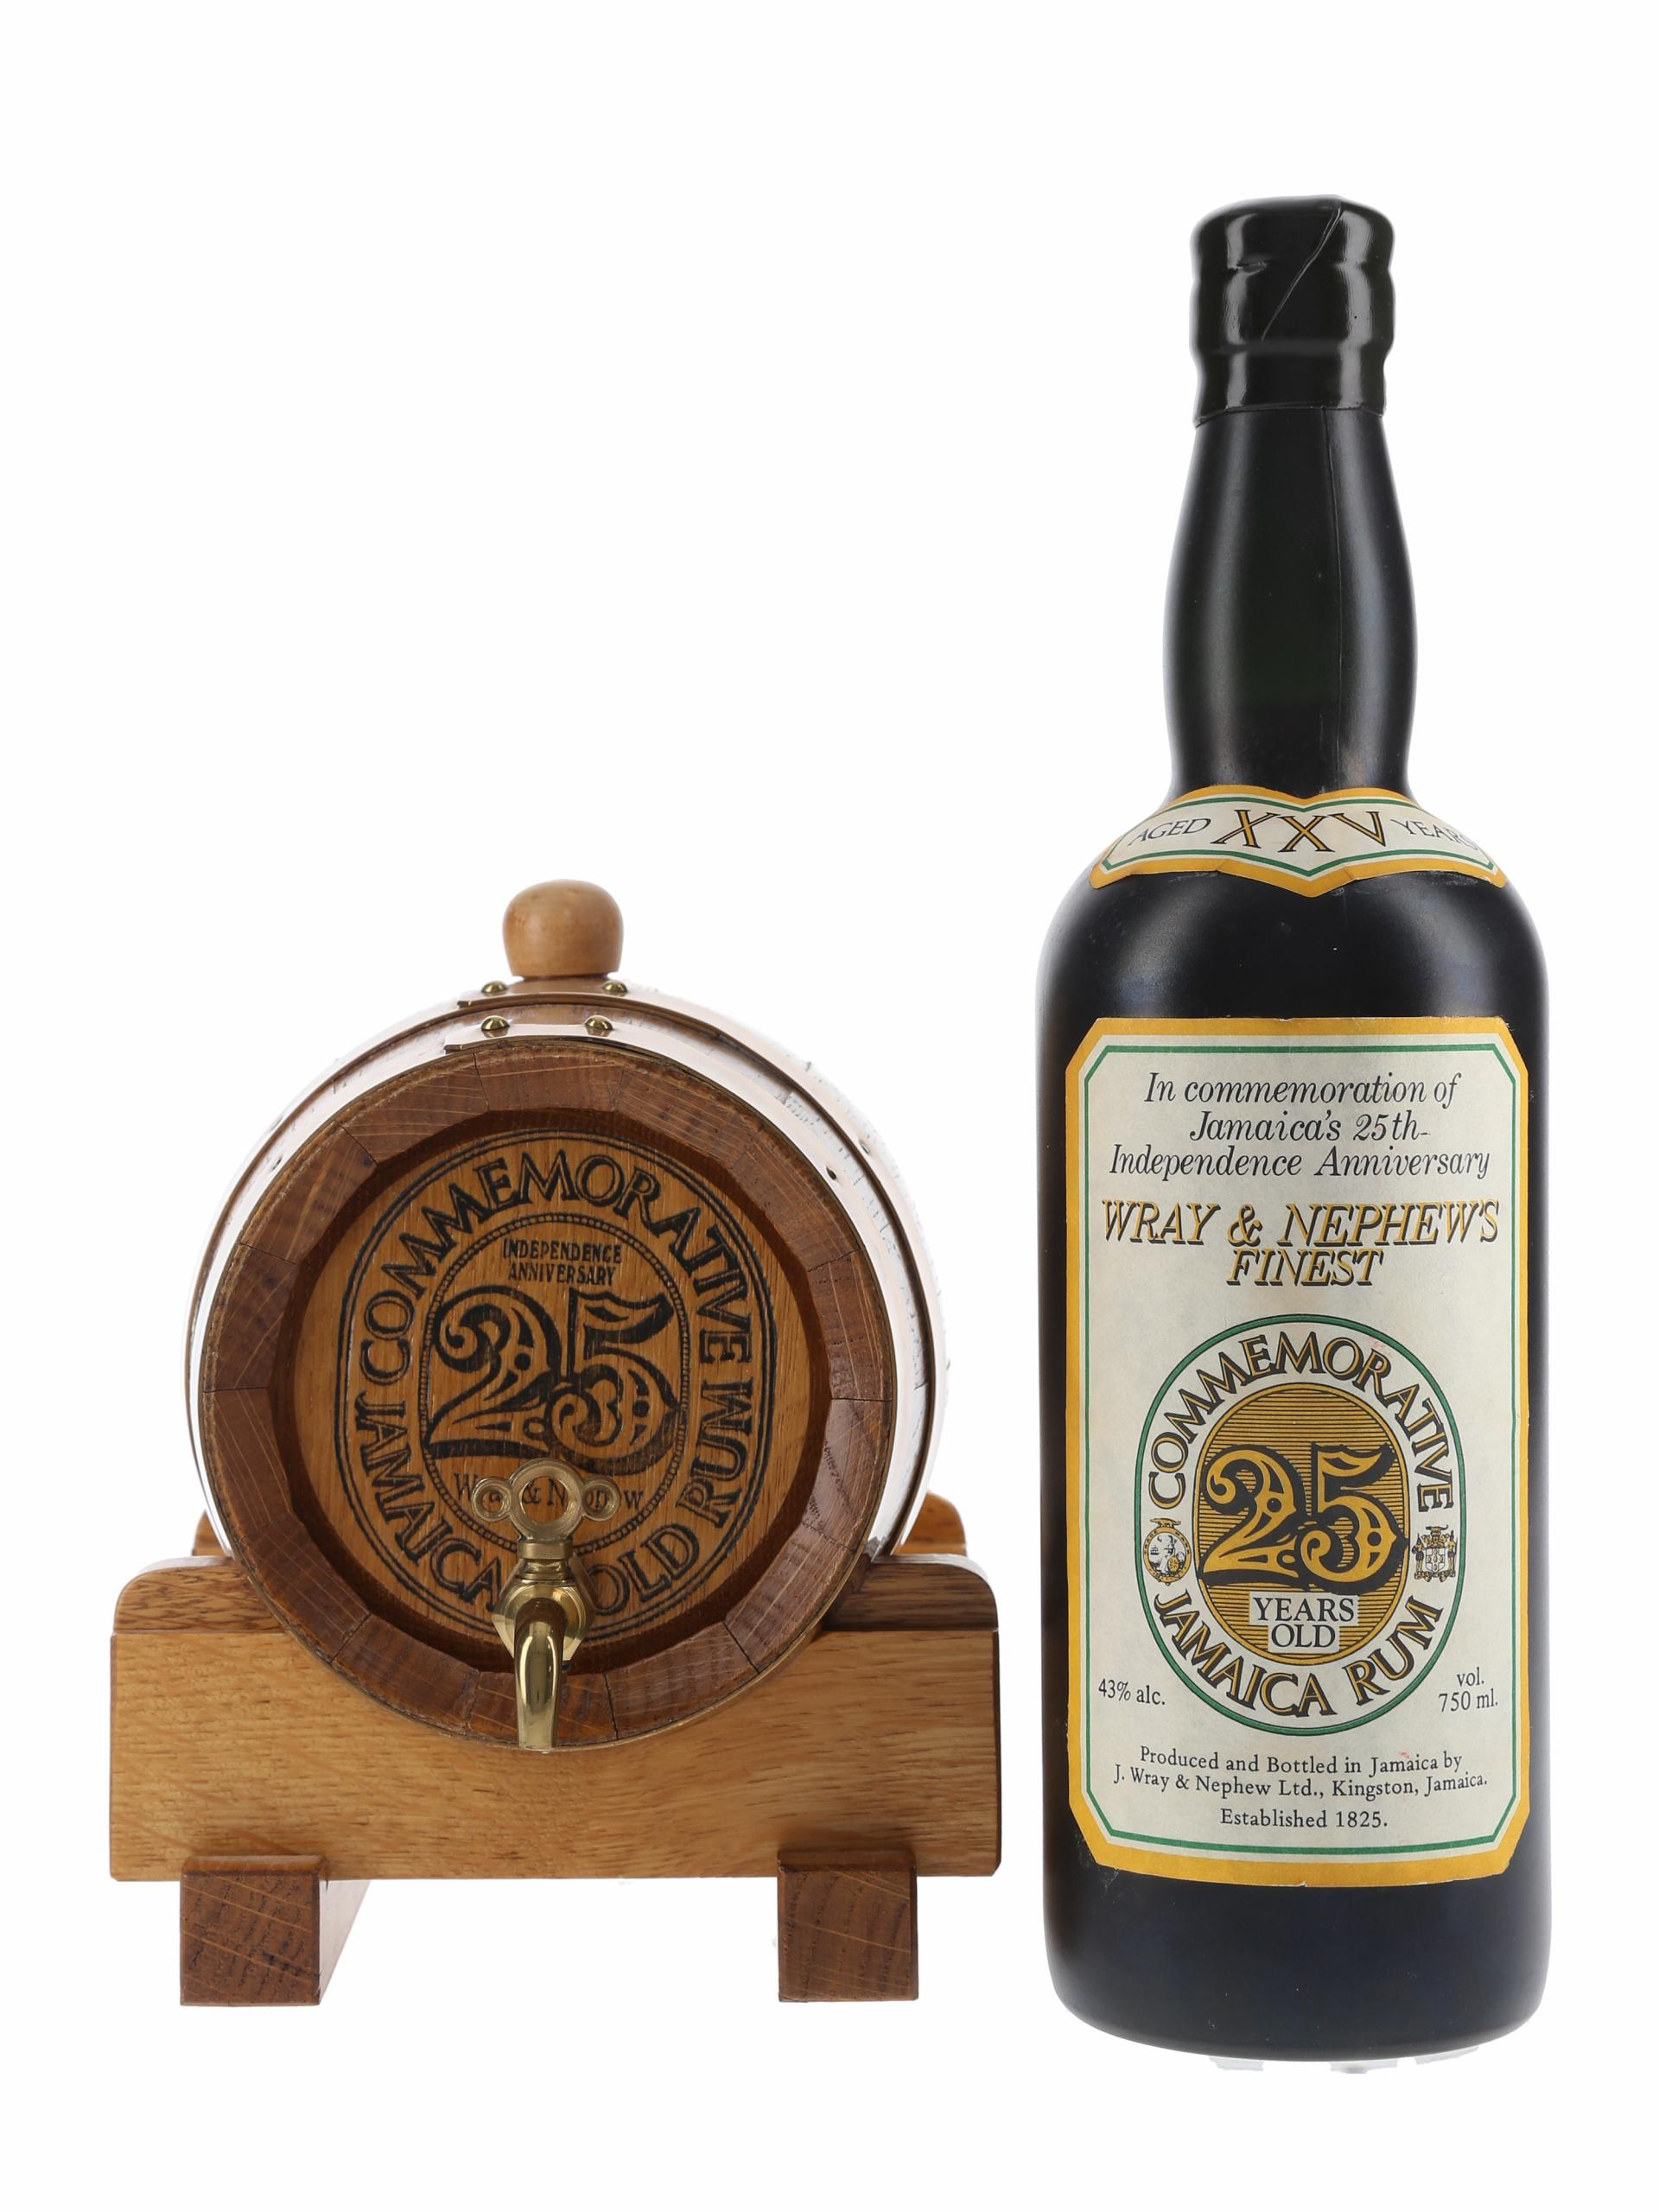 Wray & Nephew 25 Year Old Commemorative Jamaica Rum With Barrel Bottled 1987